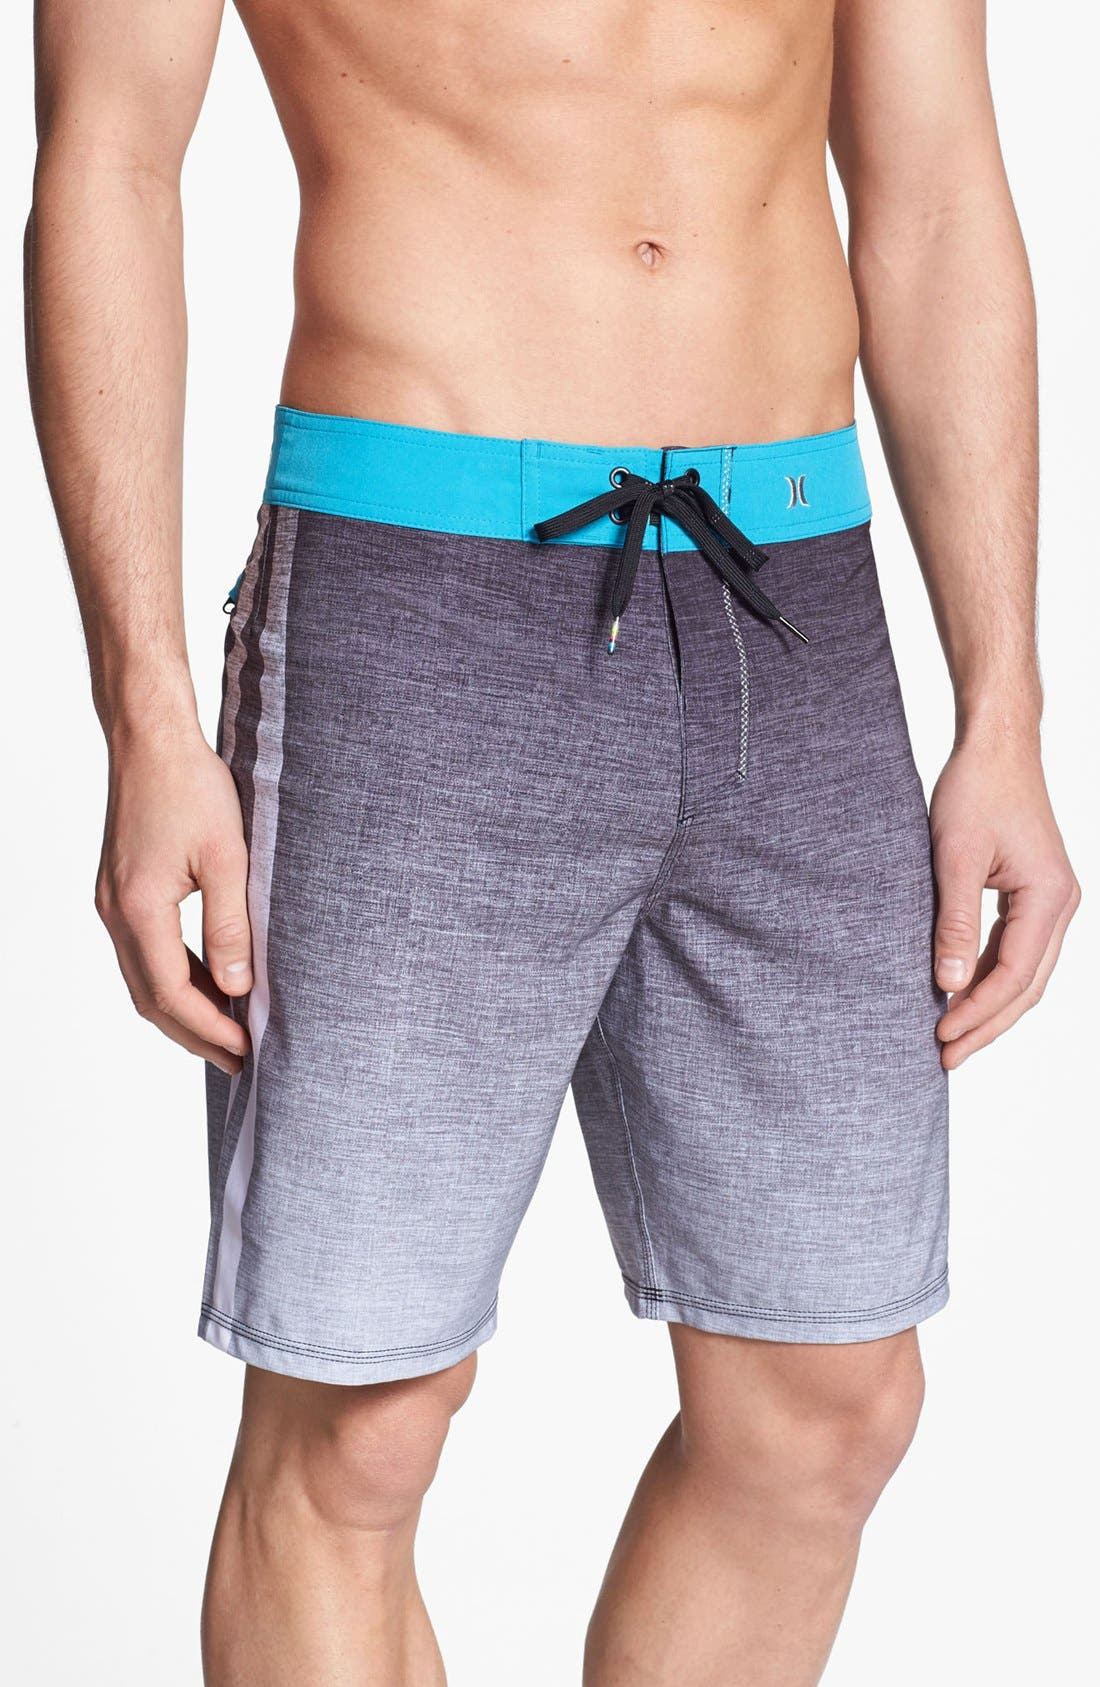 HURLEY 'Phantom 30 Duo' Board Shorts, Main, color, 420